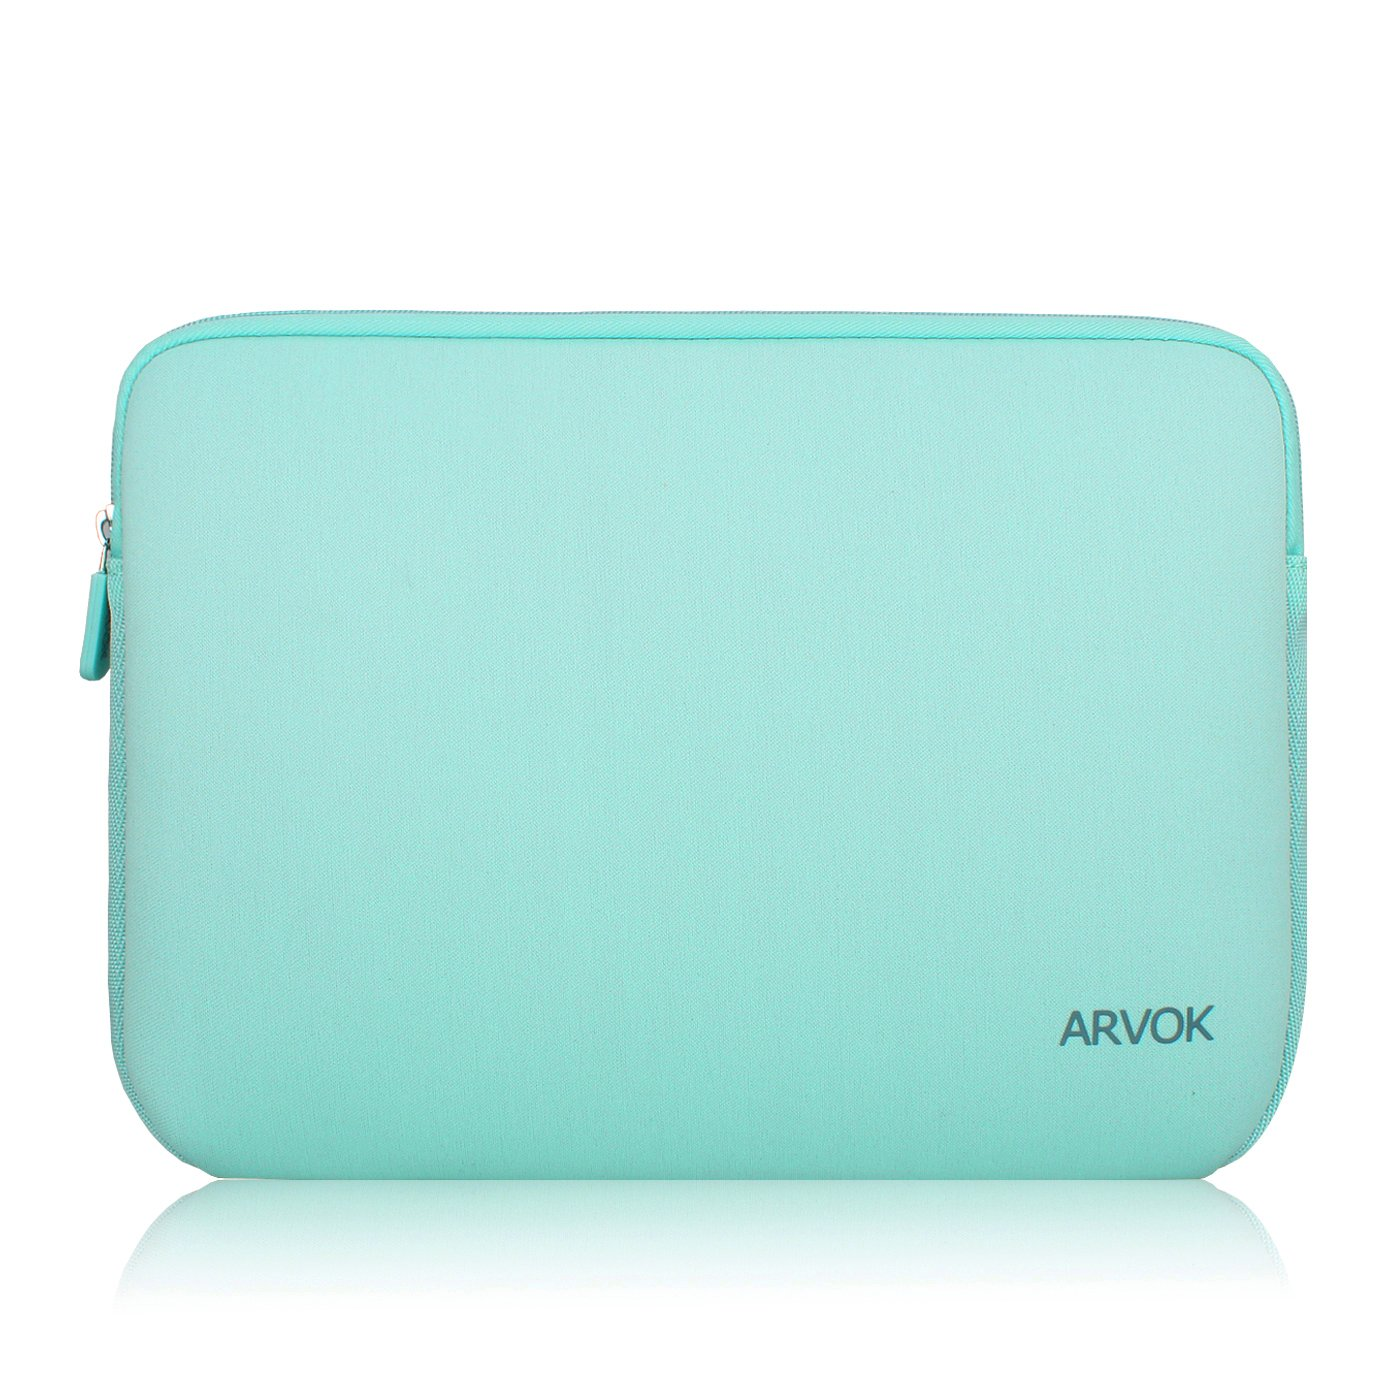 ARVOK Multi Color Water Resistant Neoprene Notebook